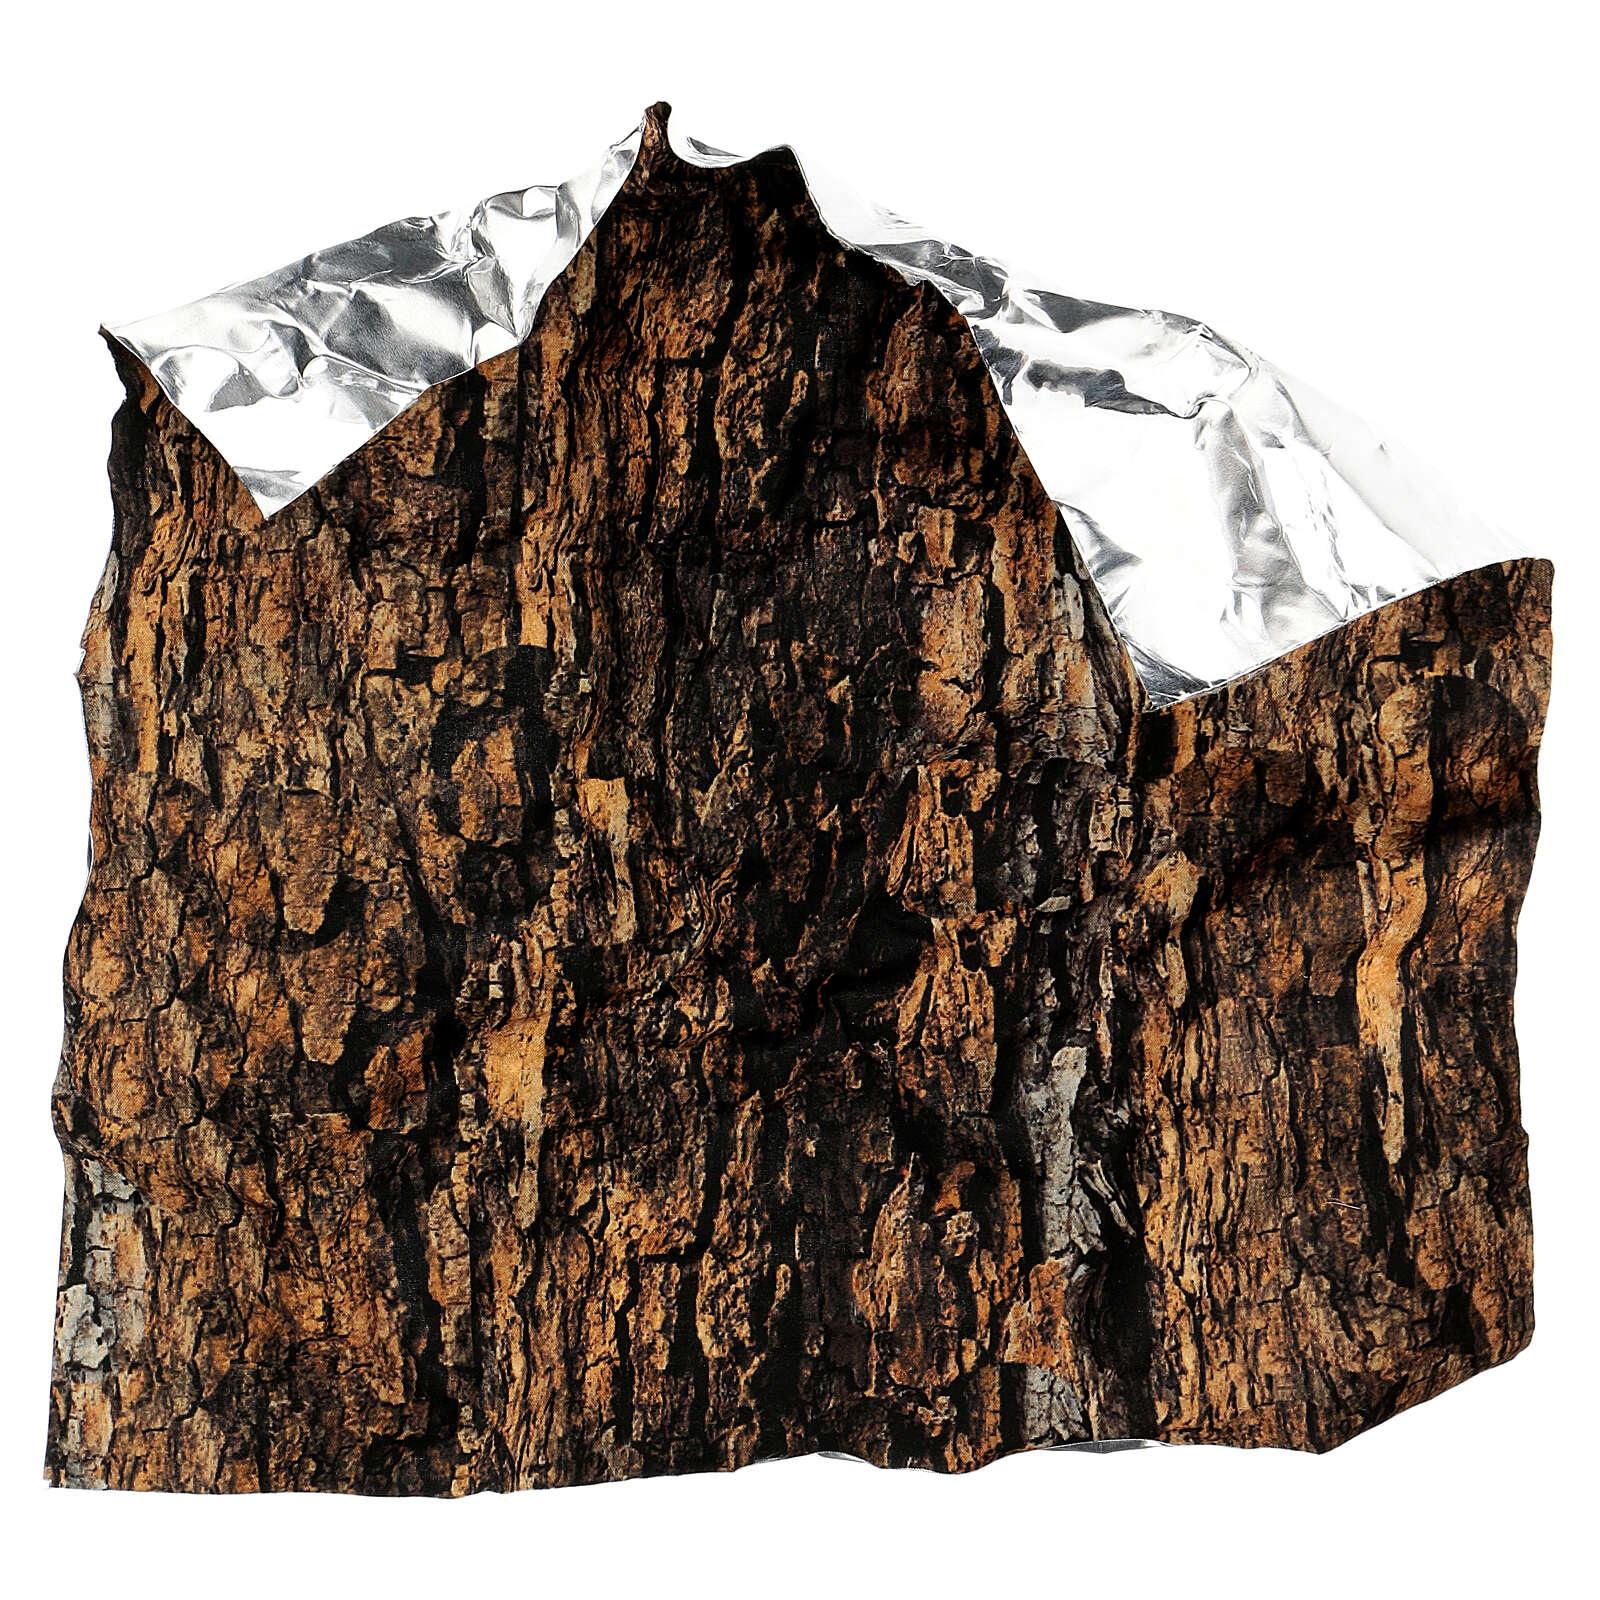 Papier do modelowania korek kora drzewa 30x30 cm, do szopek 4